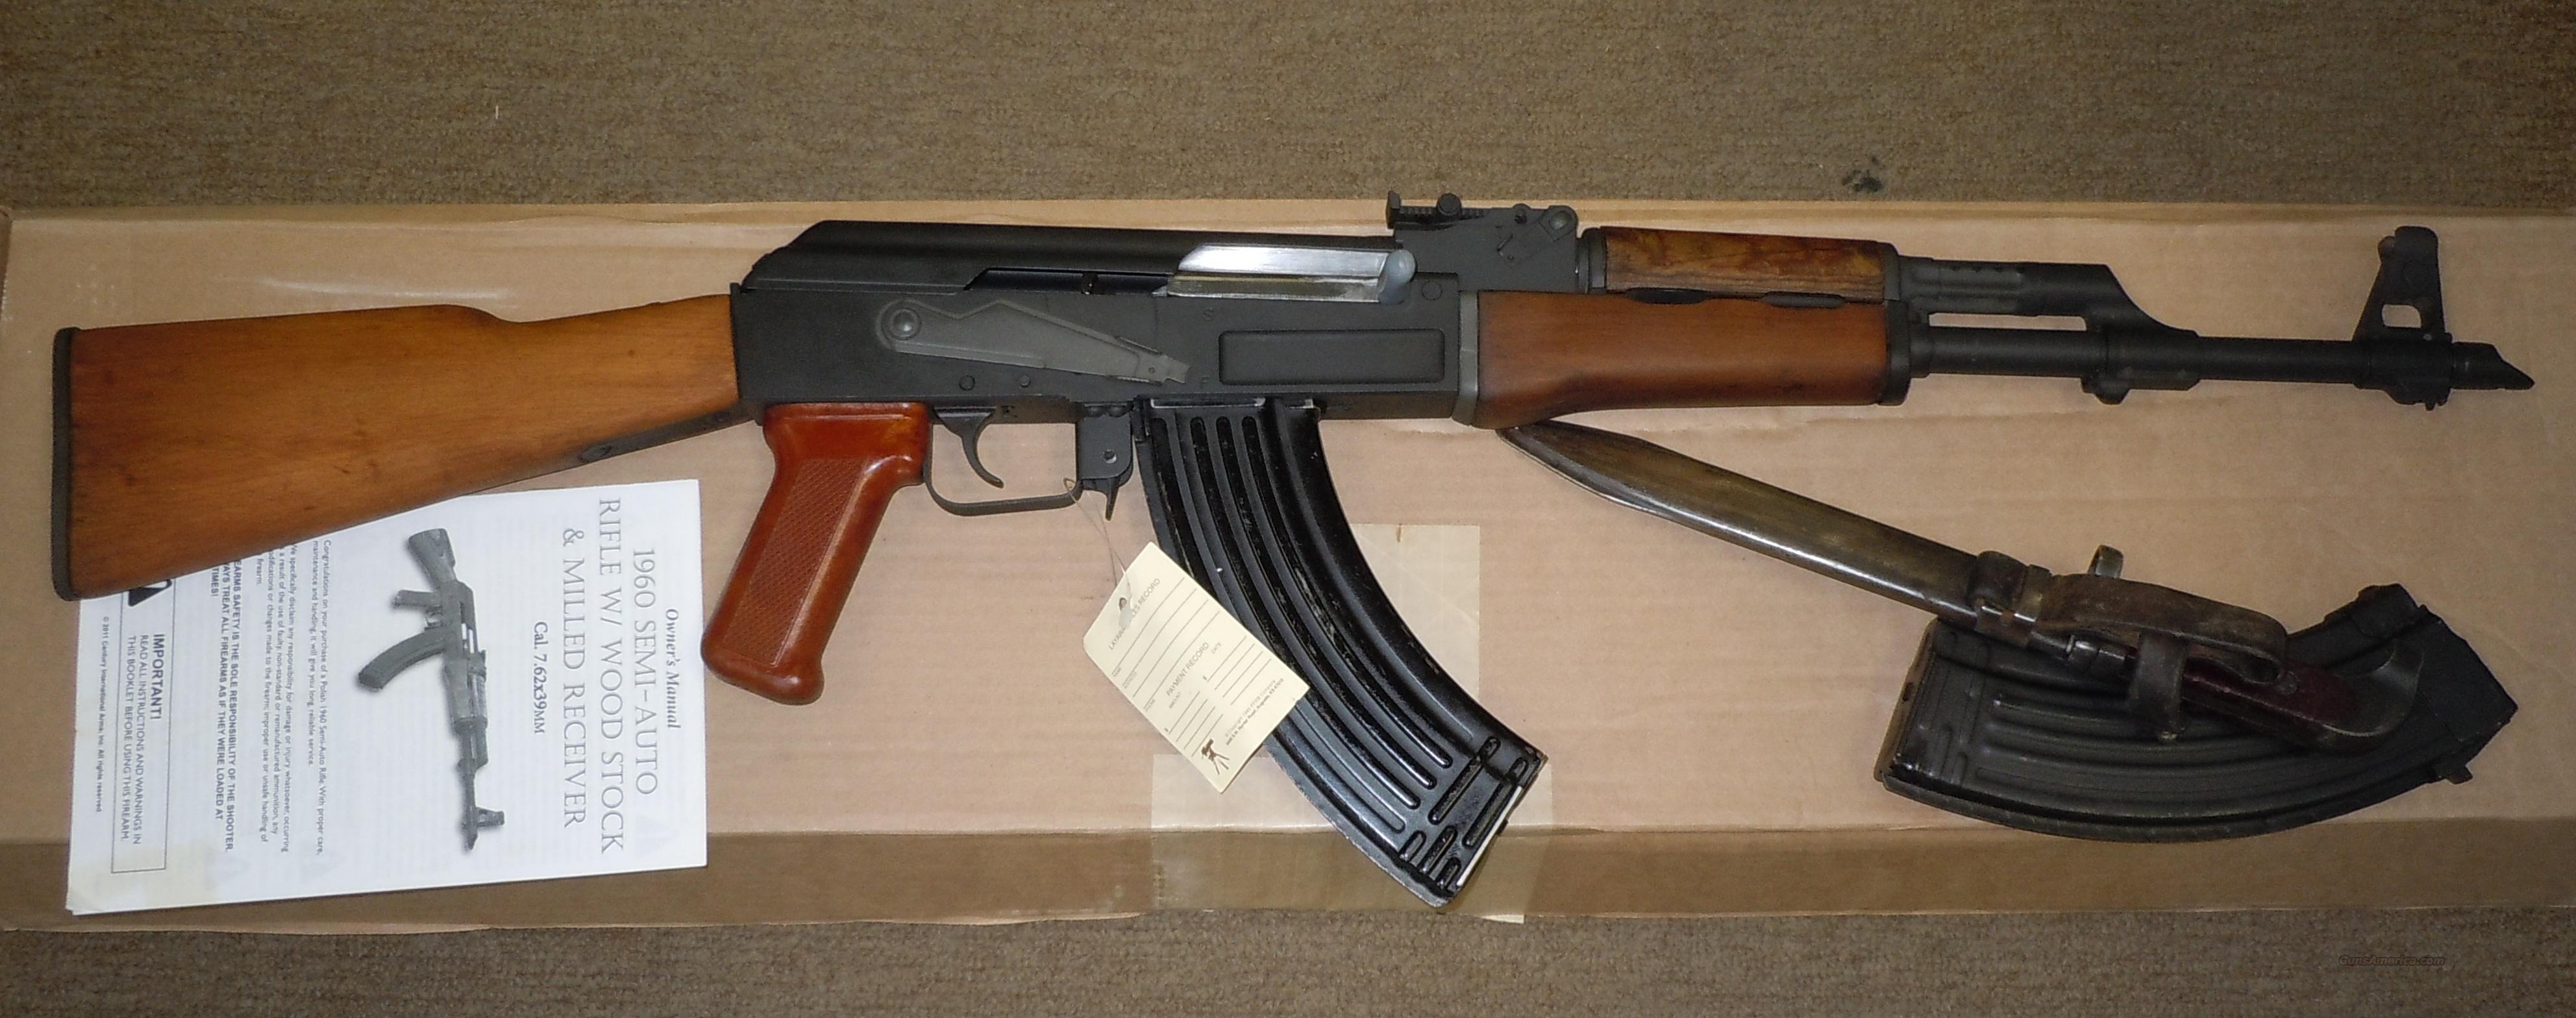 CENTURY ARMS 1960 7 62X39 AK-47 RIFLE *MILLED POLISH RECEIVER